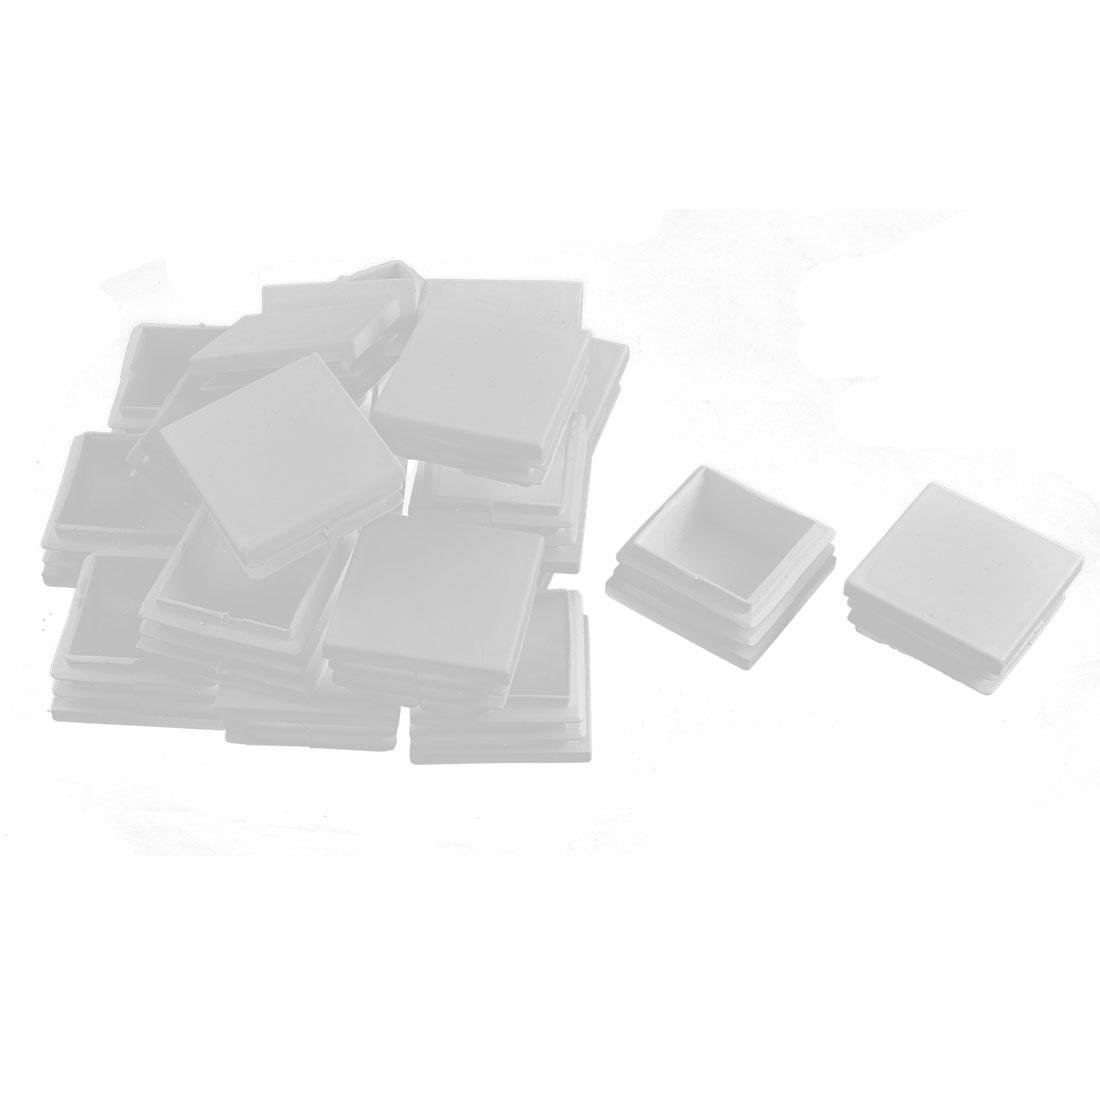 Plastic Square Tube Pipe Inserts End Blanking Caps White 40mmx40mm 20 Pcs